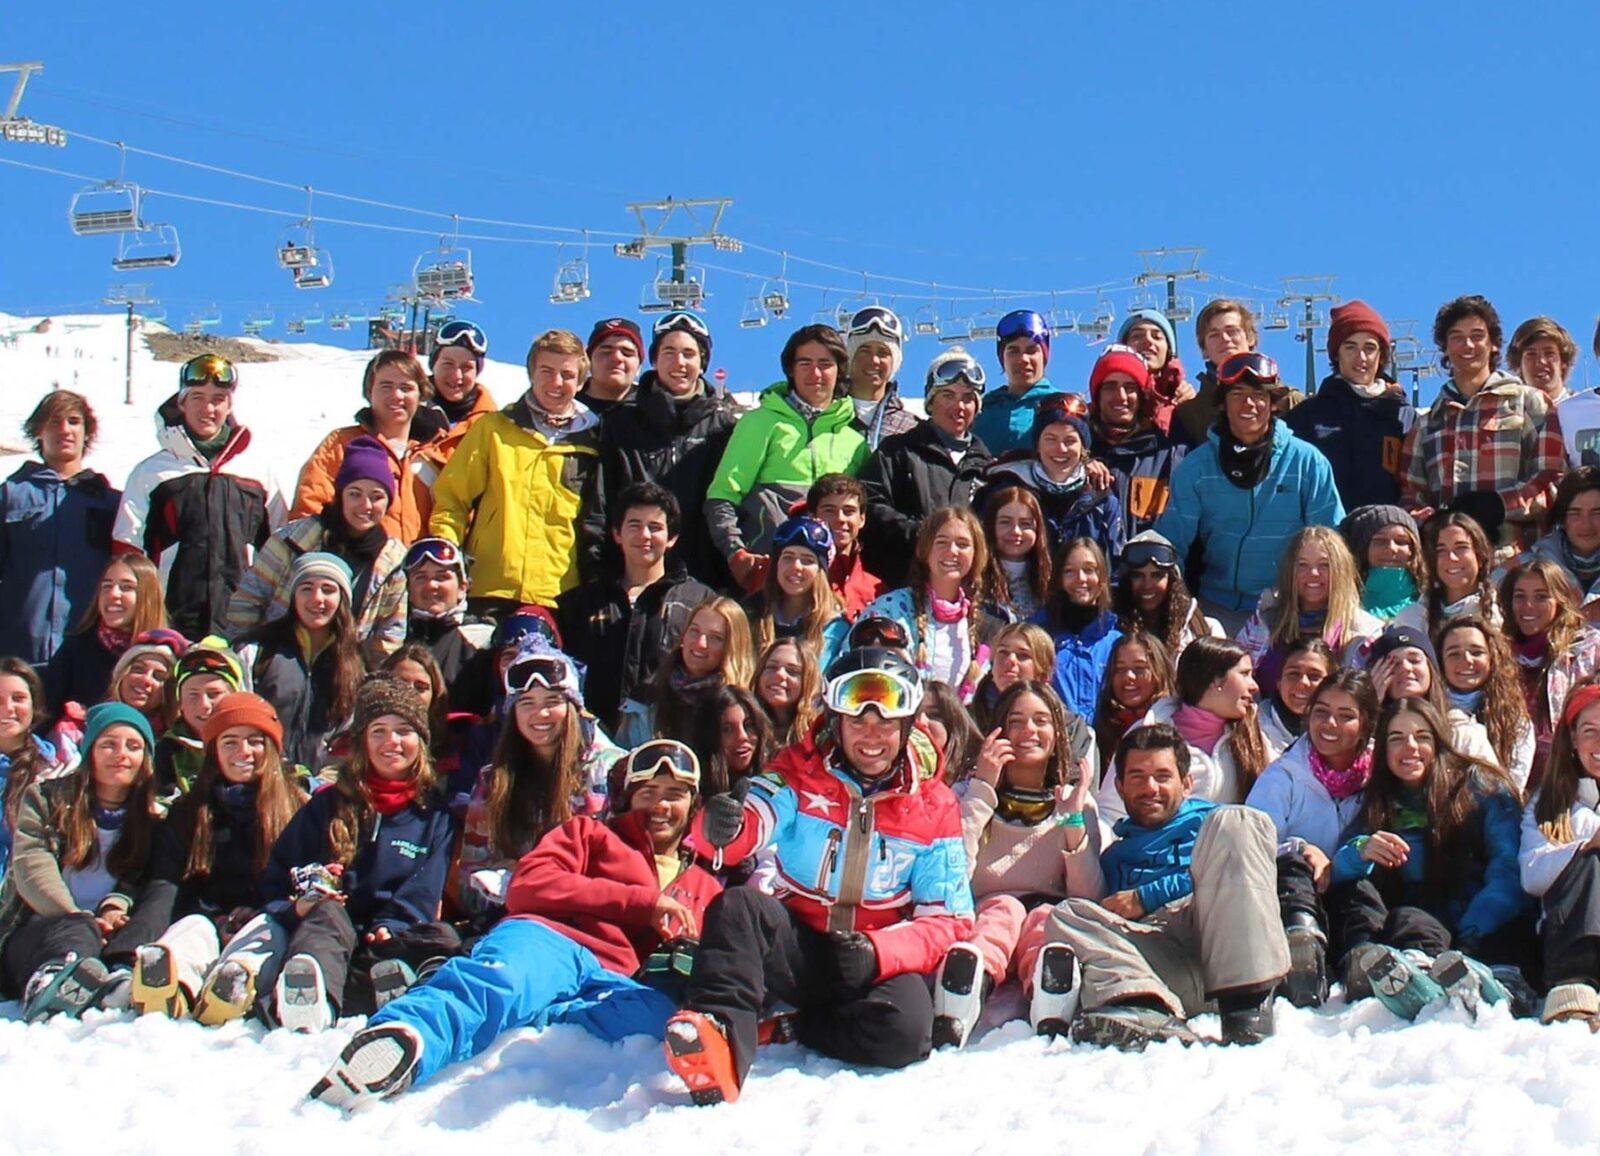 Escuela esquí Baqueira. Clases de esquí y snowboard - 22